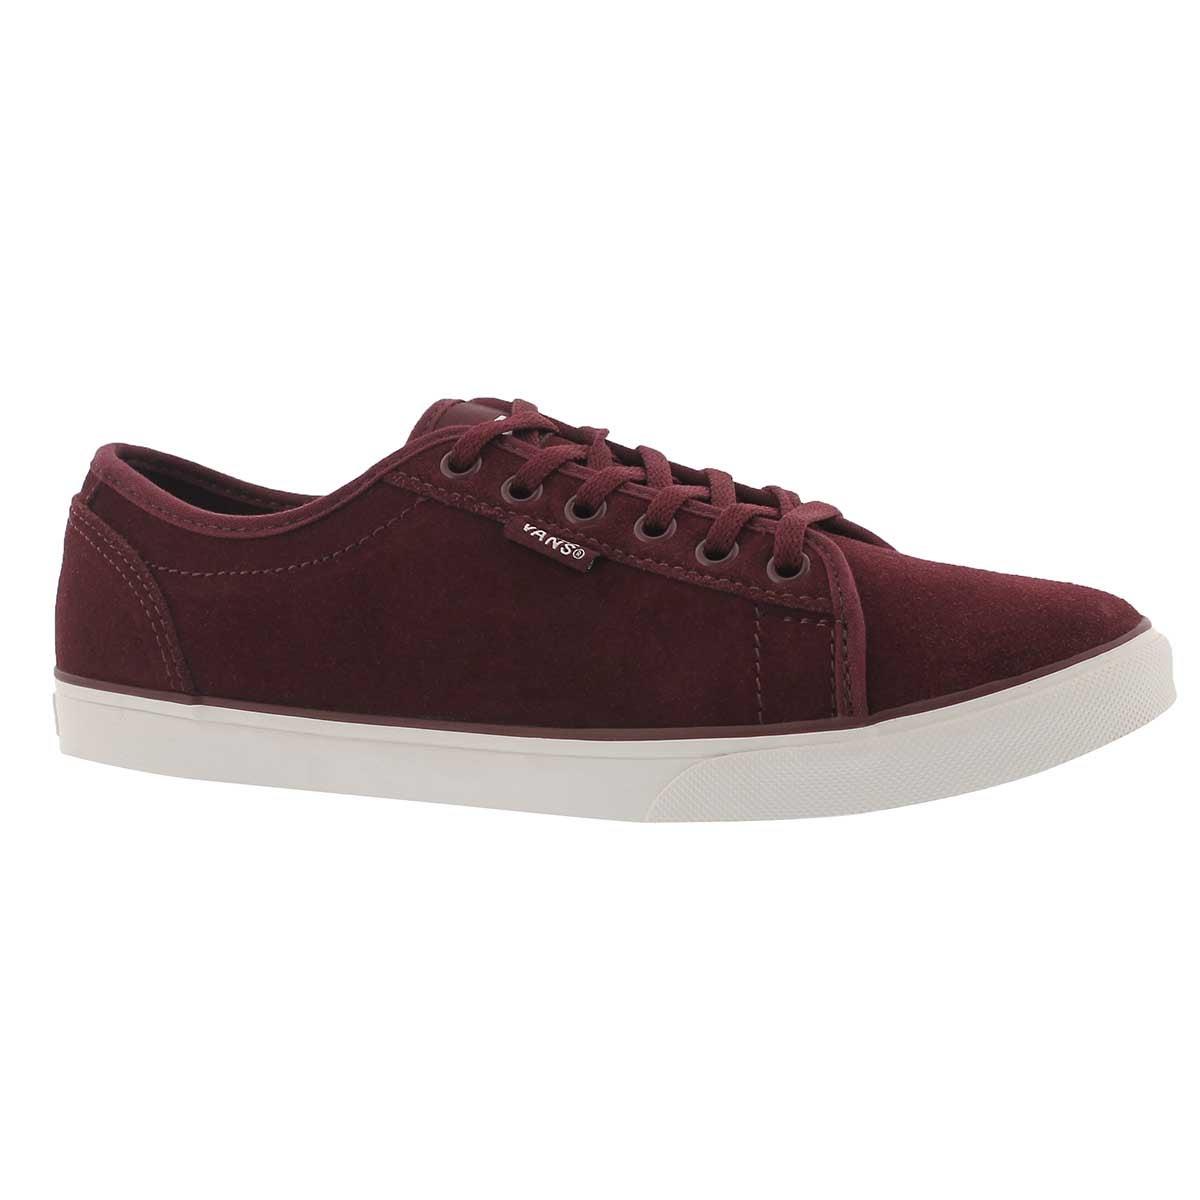 Women's ROWAN burgundy laceup sneakers